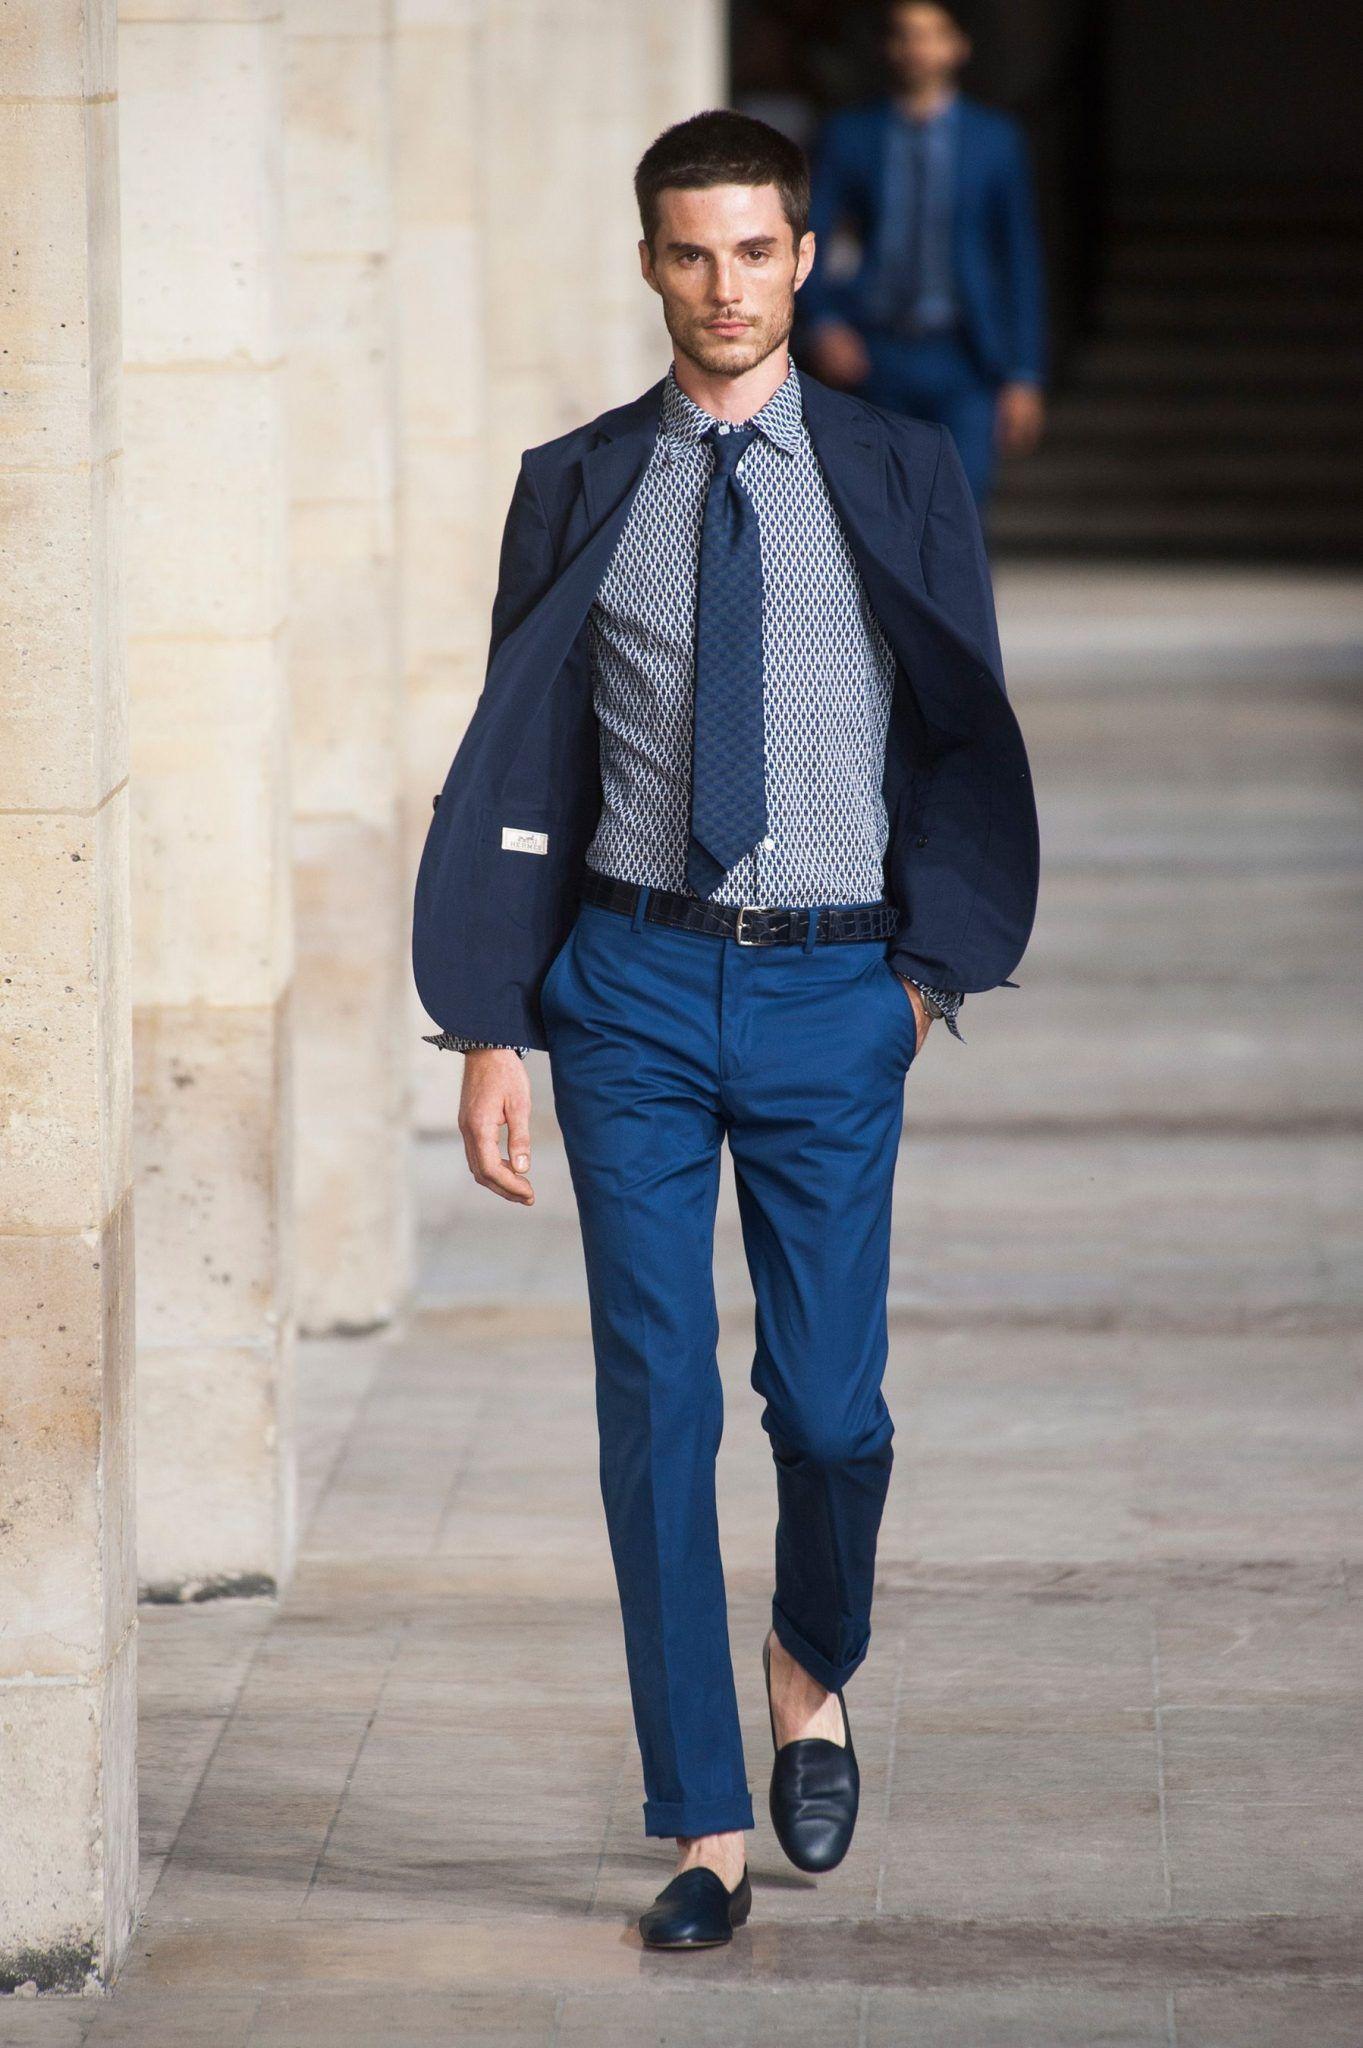 Royal Blue vs Navy Blue: How to Wear Blue | Mens fashion